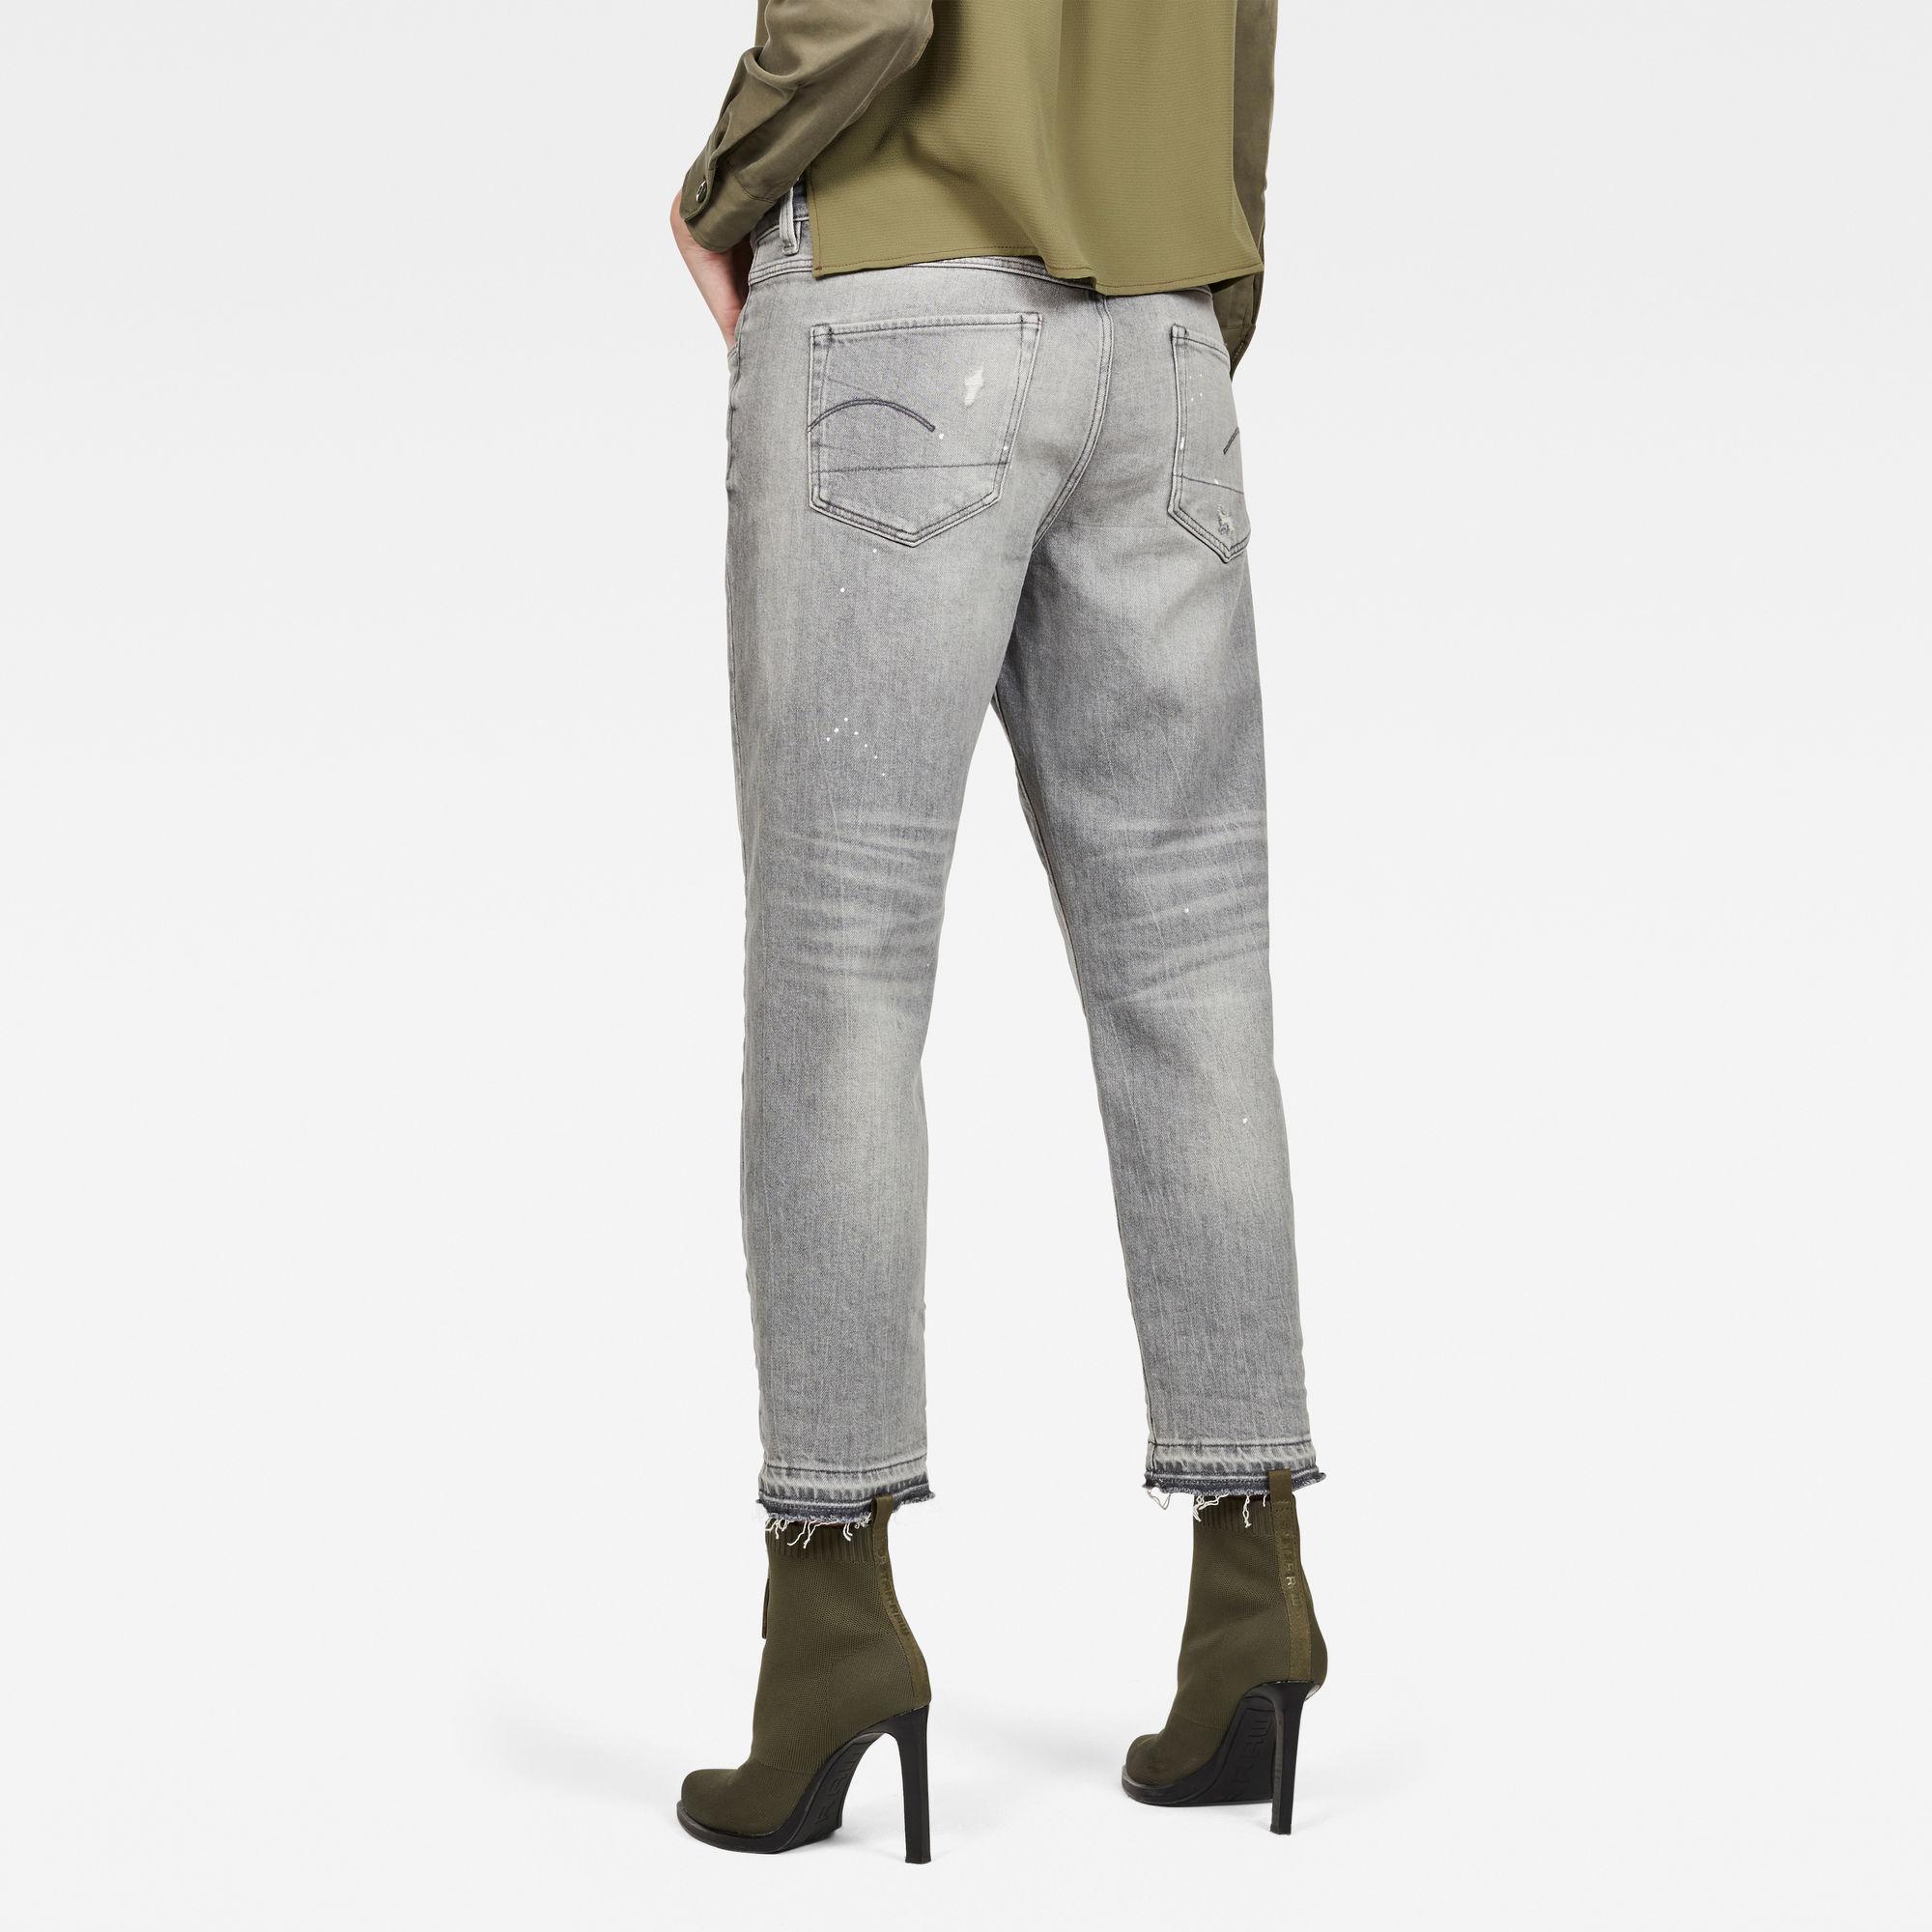 G-Star RAW 3301 RP Mid Boyfriend Jeans